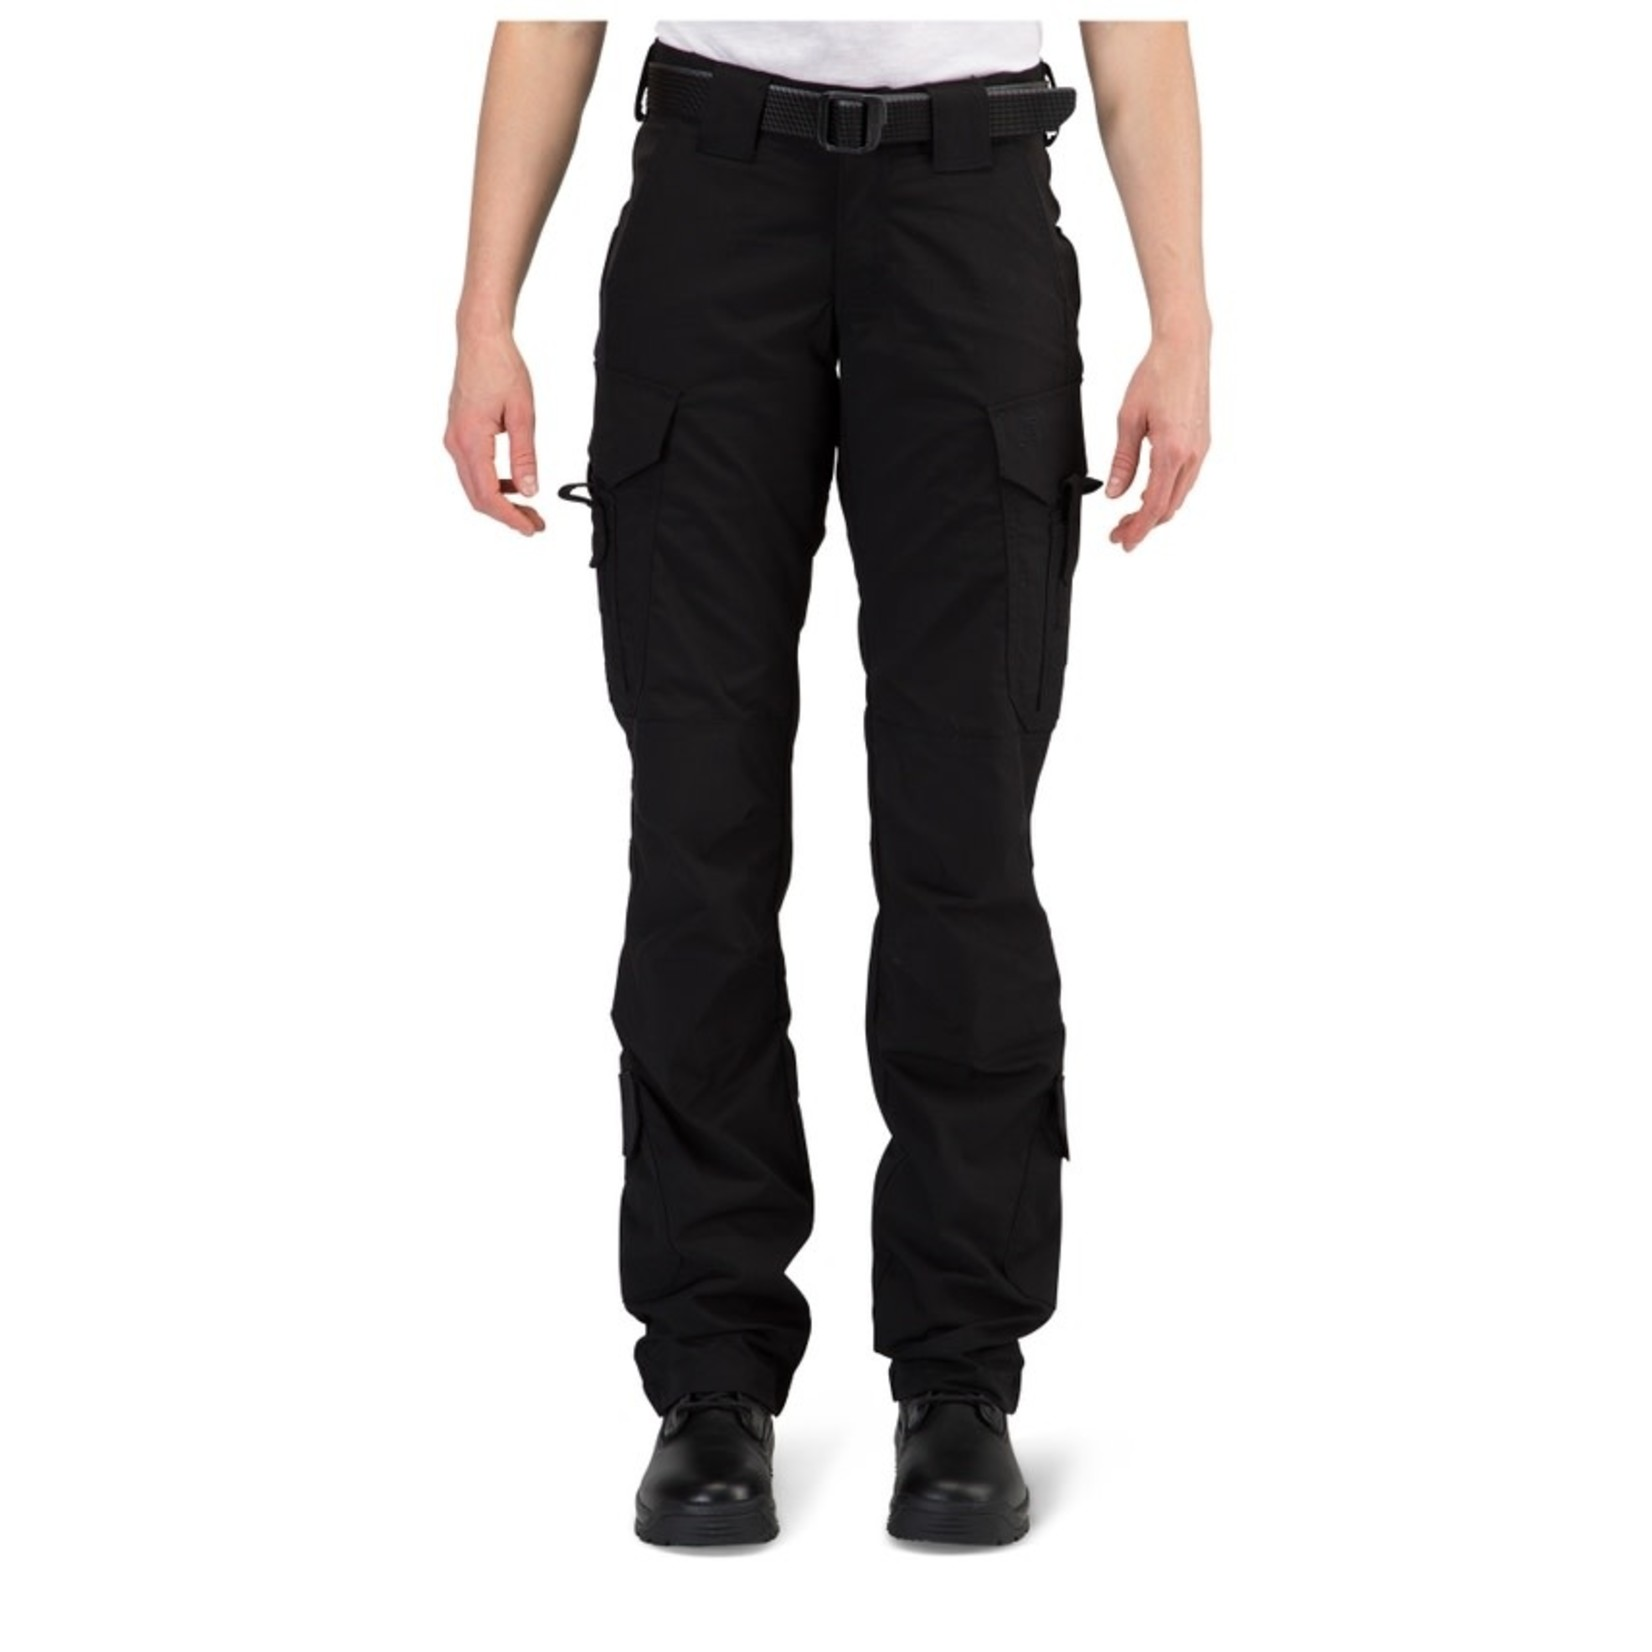 5.11 Tactical 5.11 Women's Stryke EMS Pants